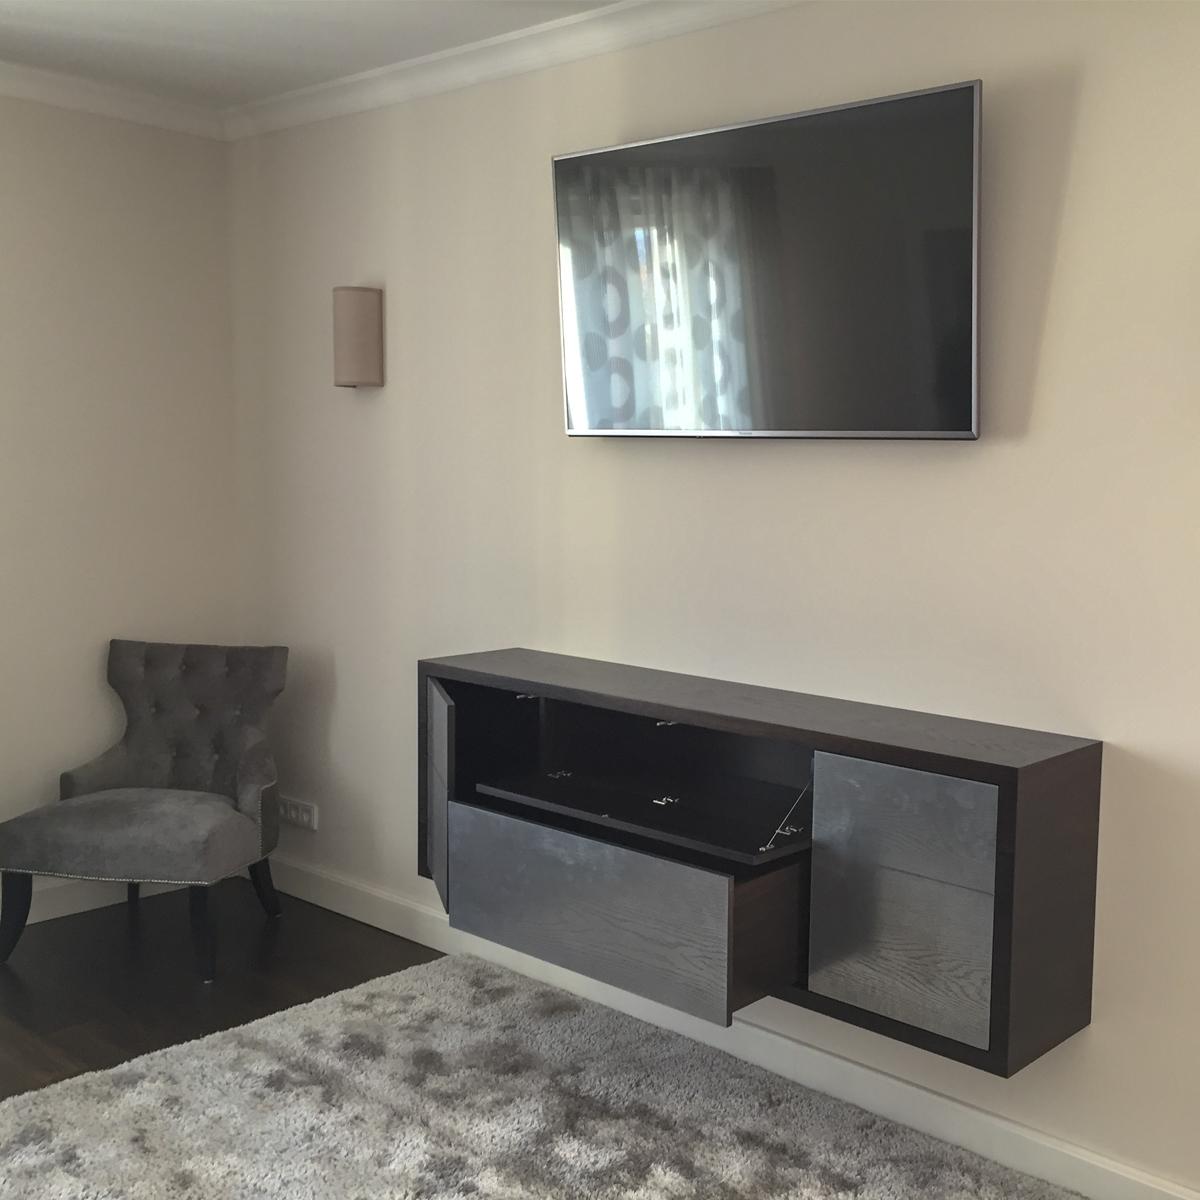 m bel stilvolle ausstattung individueller wohnr ume. Black Bedroom Furniture Sets. Home Design Ideas